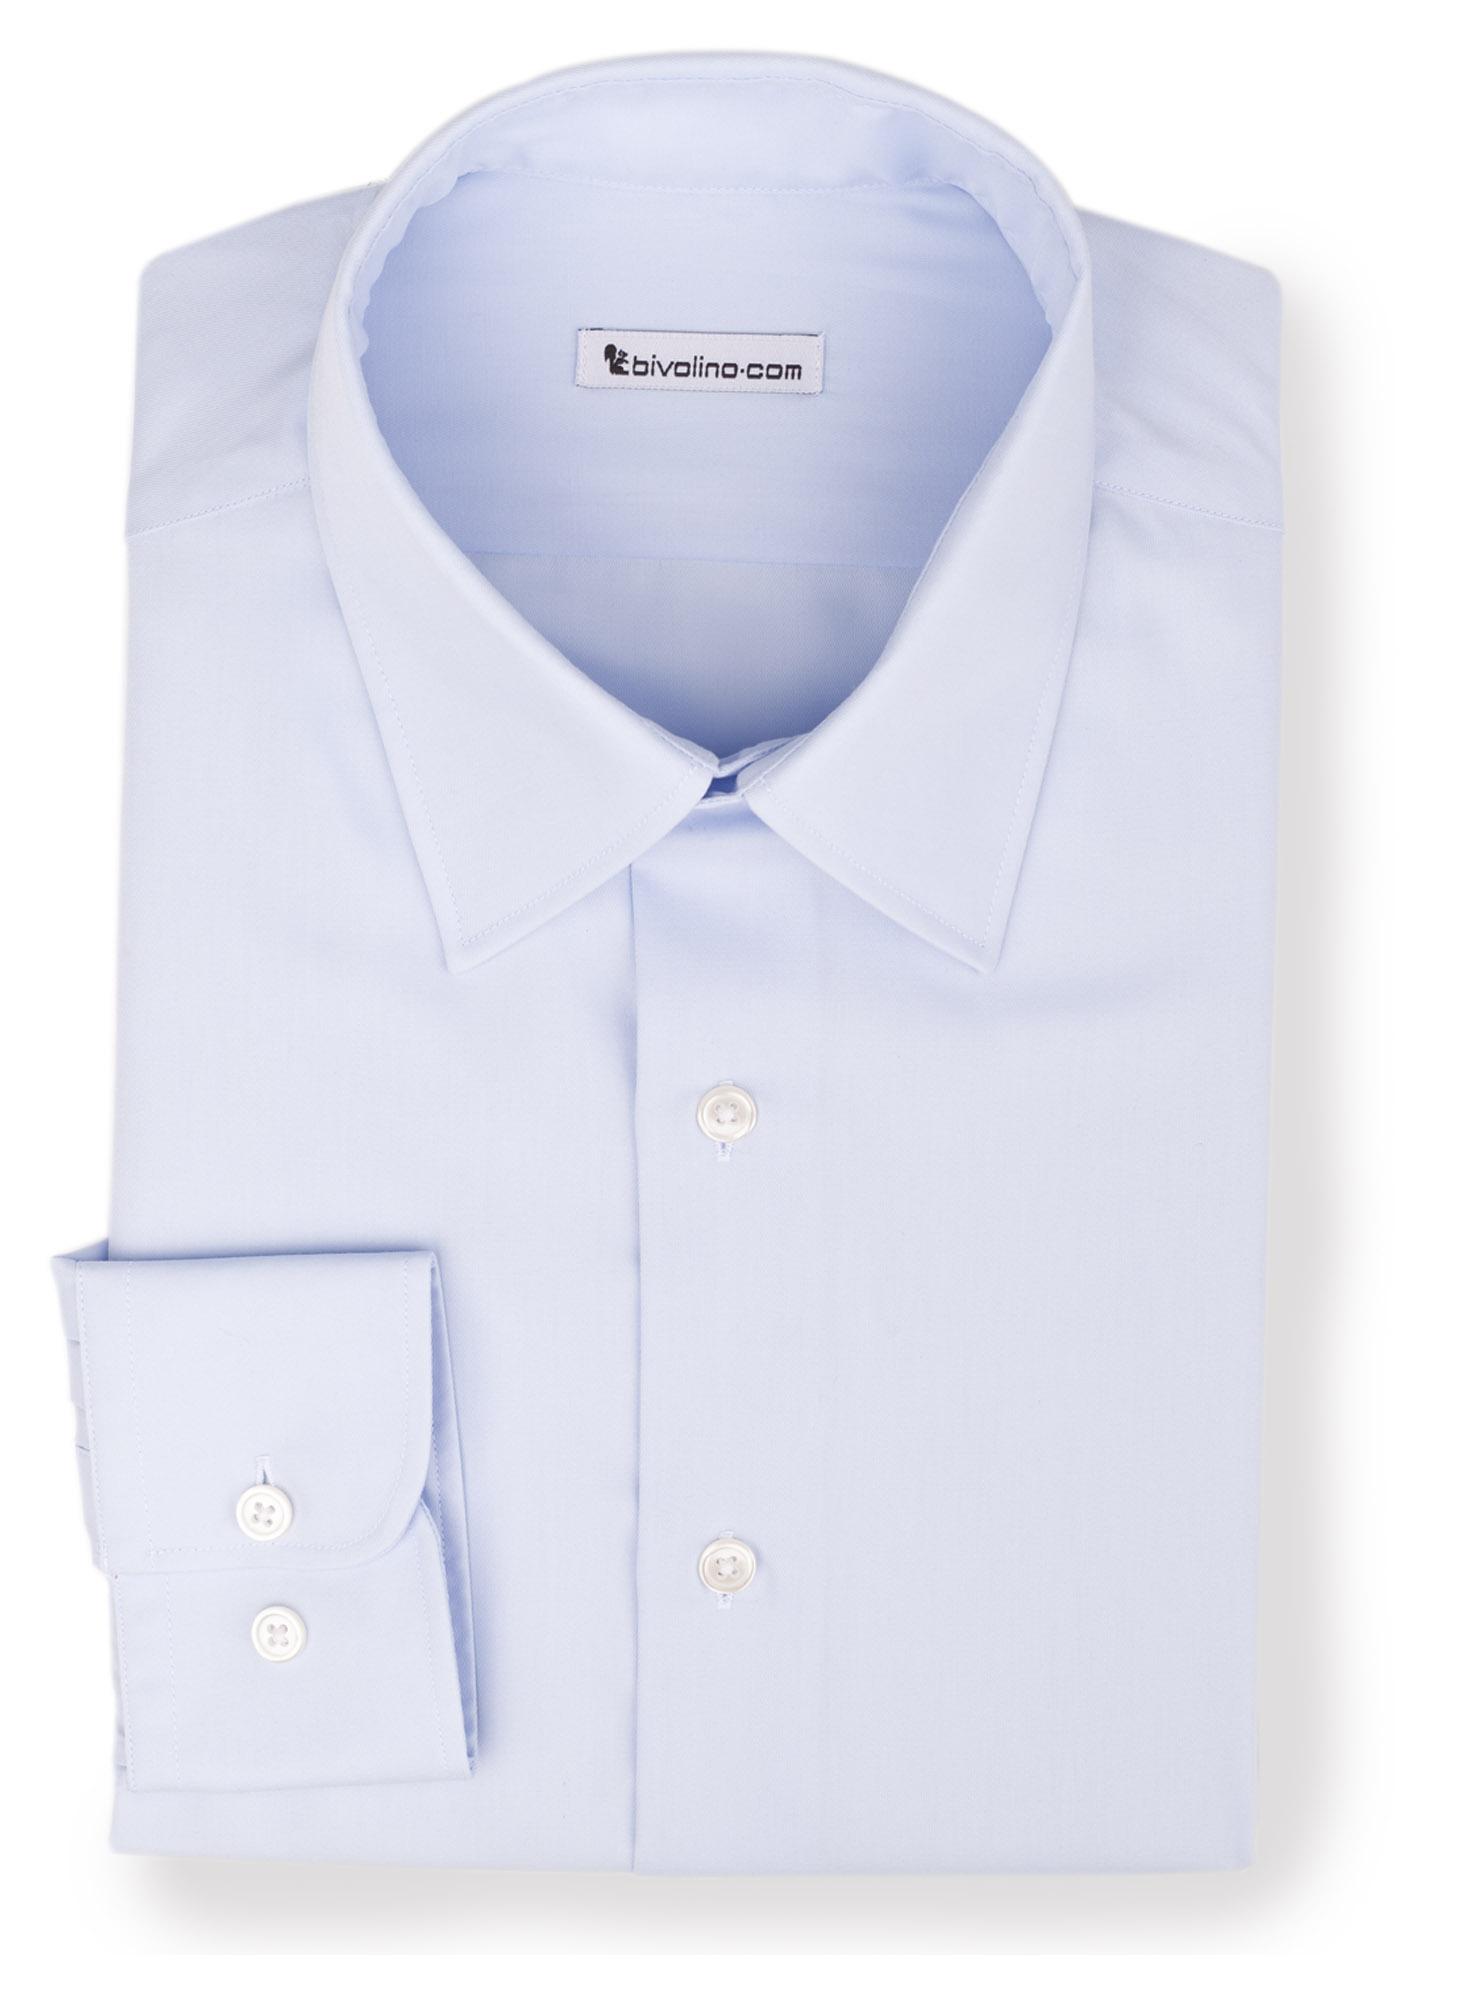 GREBALDINI -  Blue twill non-iron shirt - Opal 2